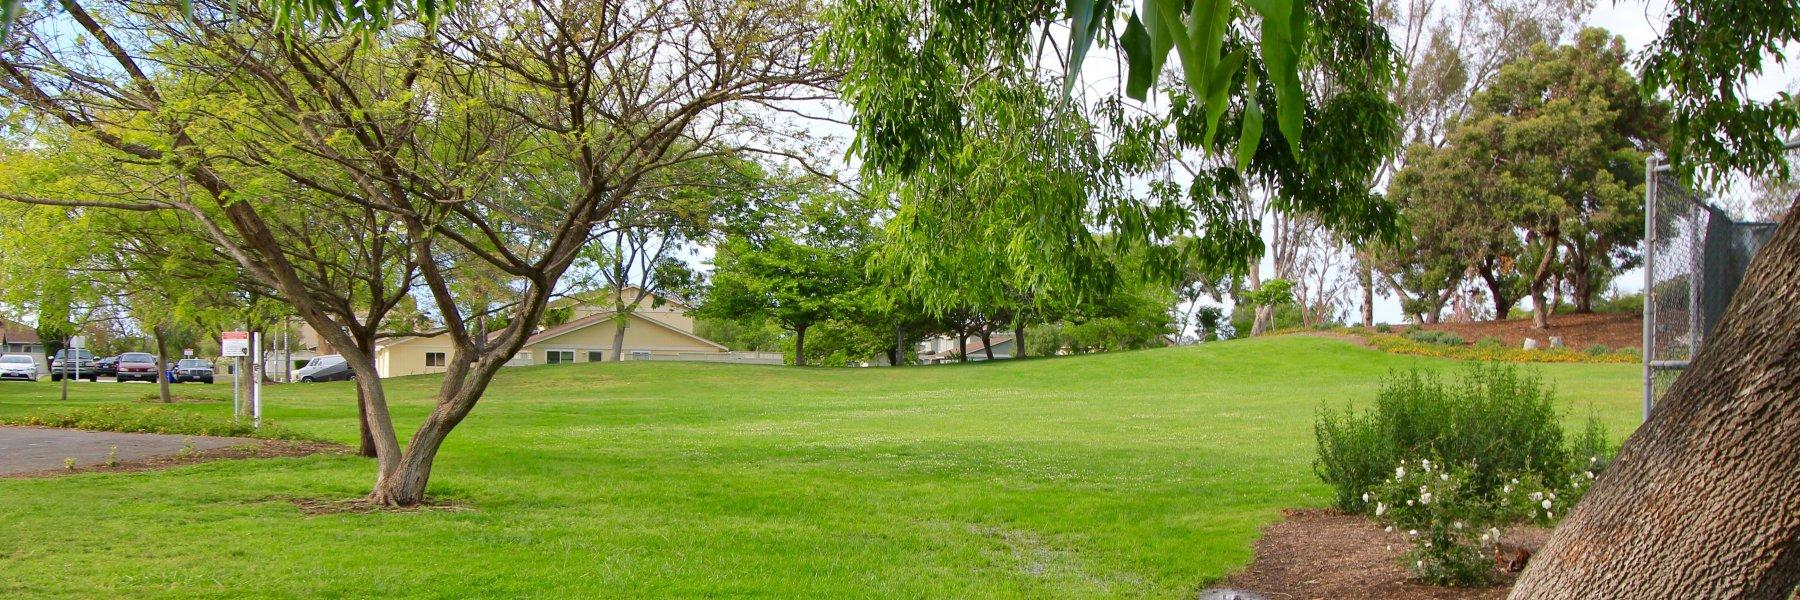 Village Park is a community of homes in Encinitas California